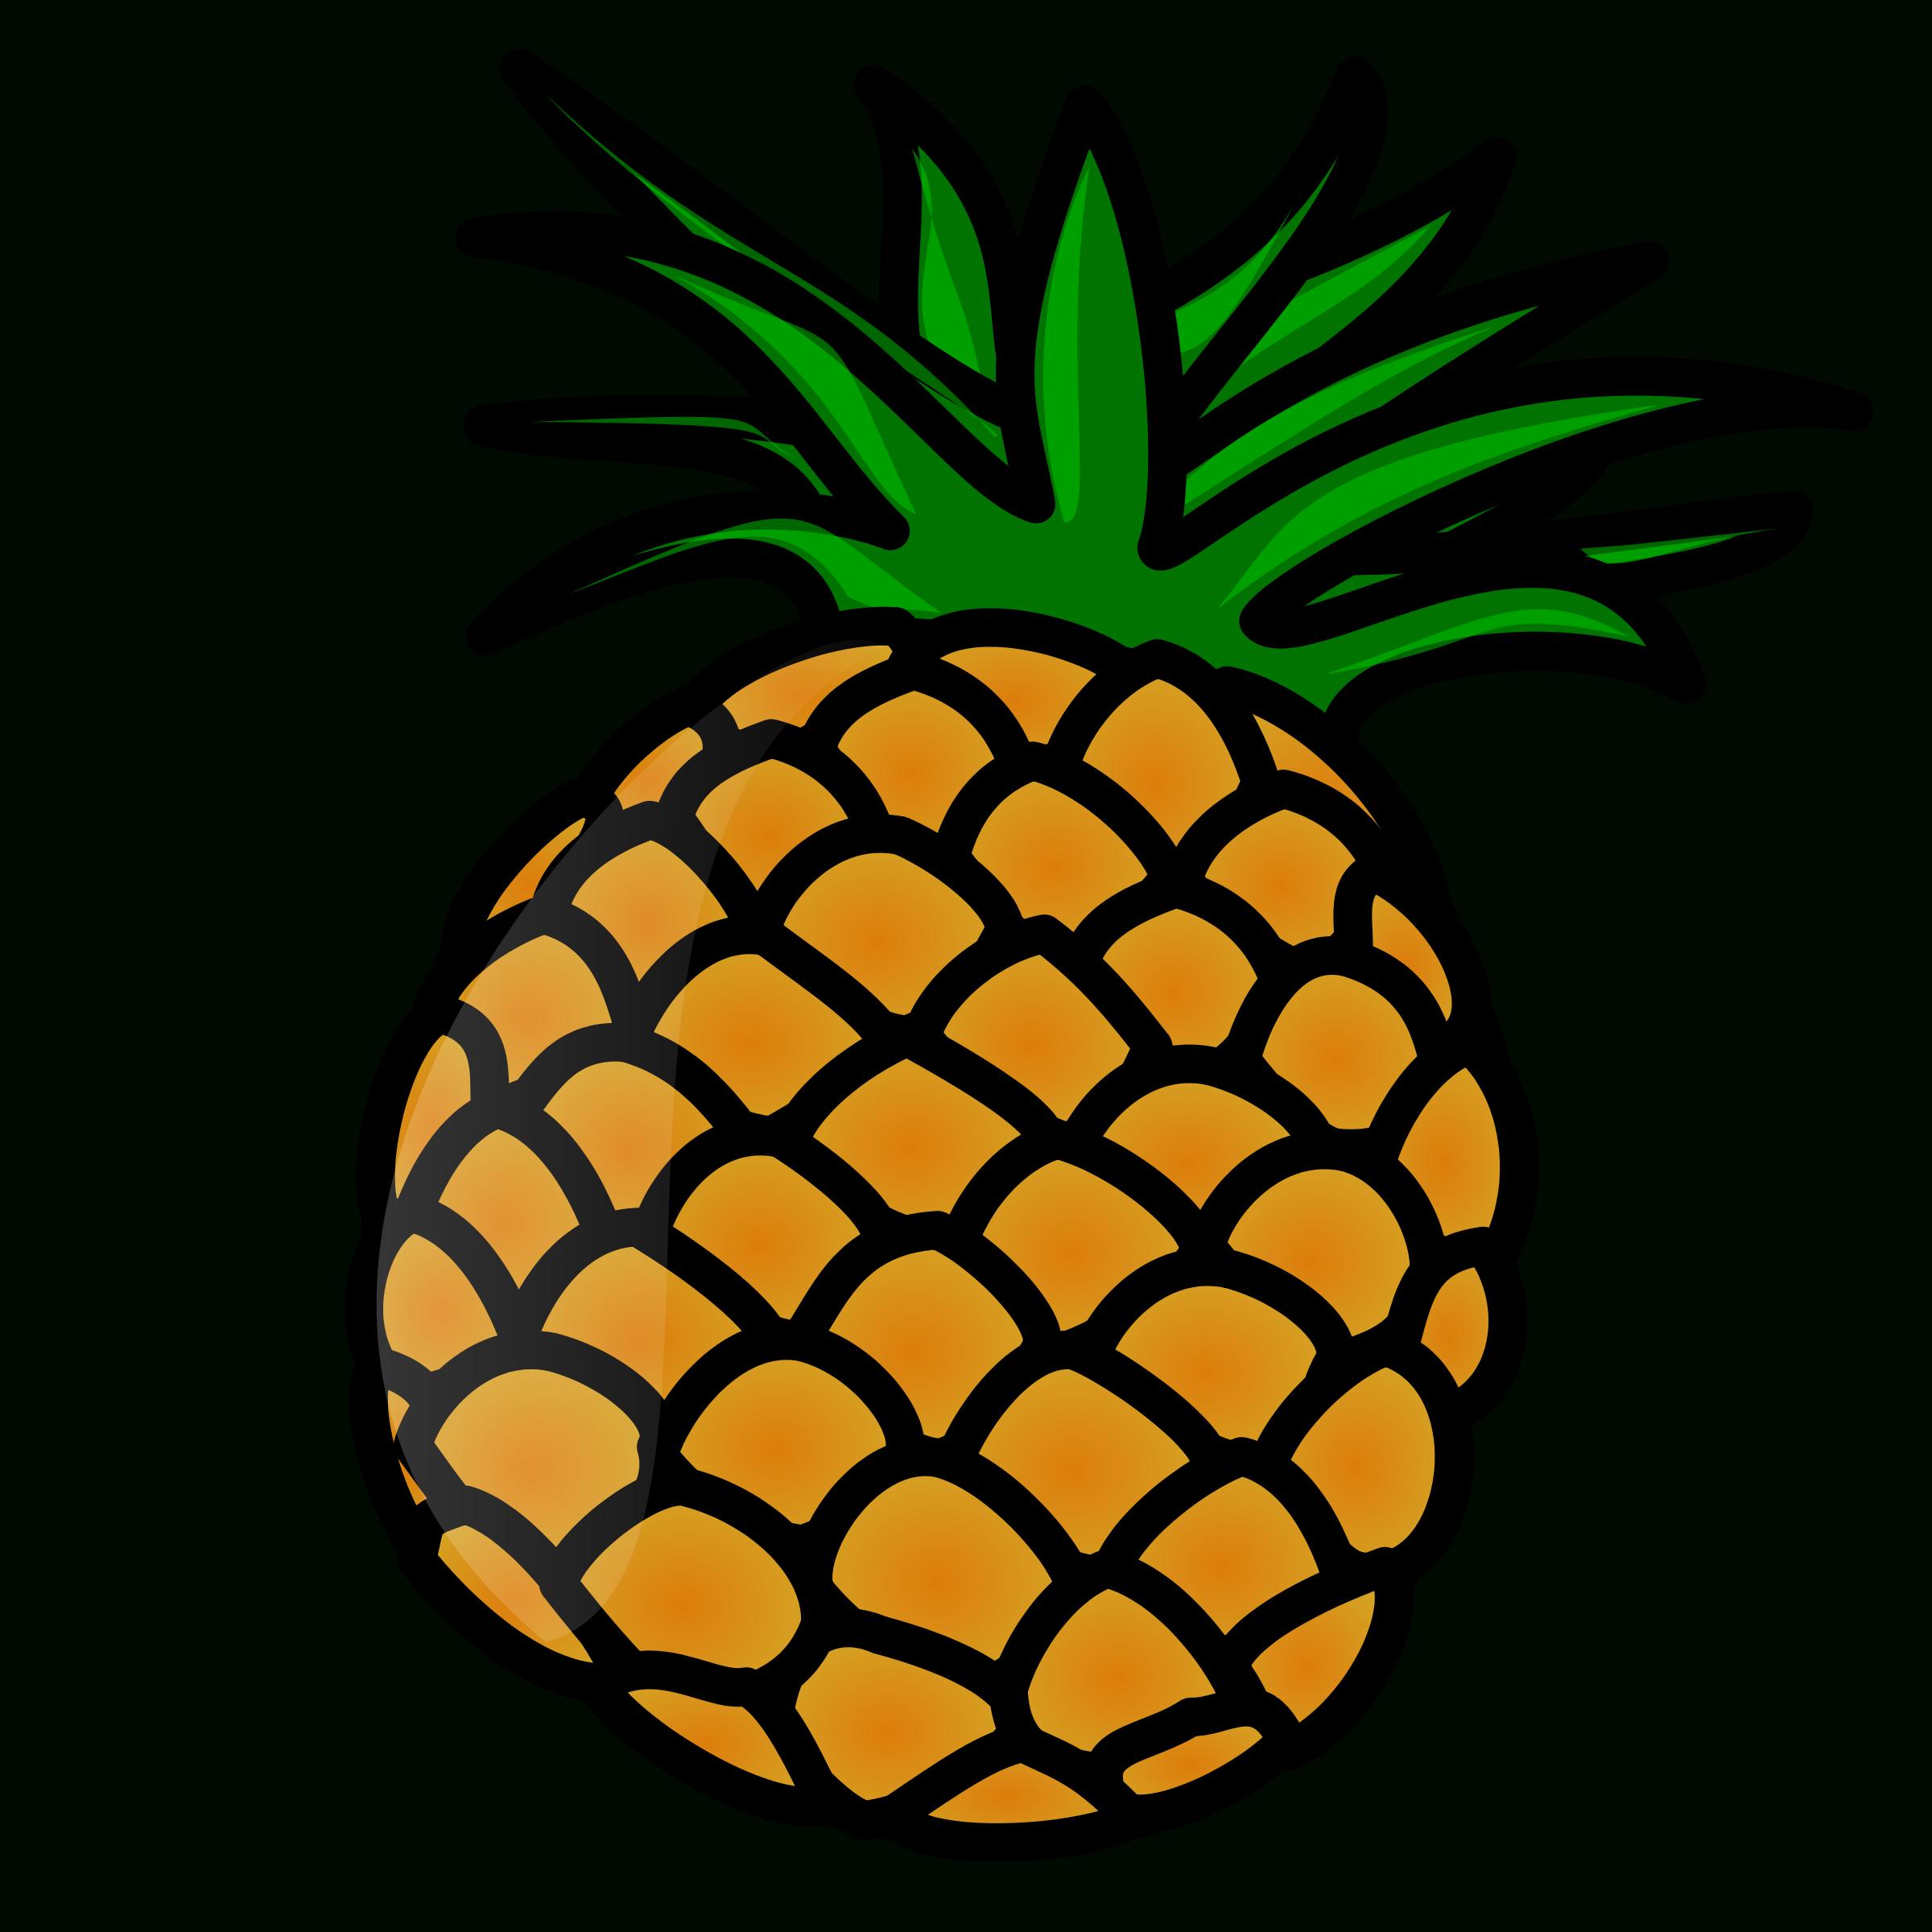 Pineapple clipart monogram. Slice letters format nicubunupineapple